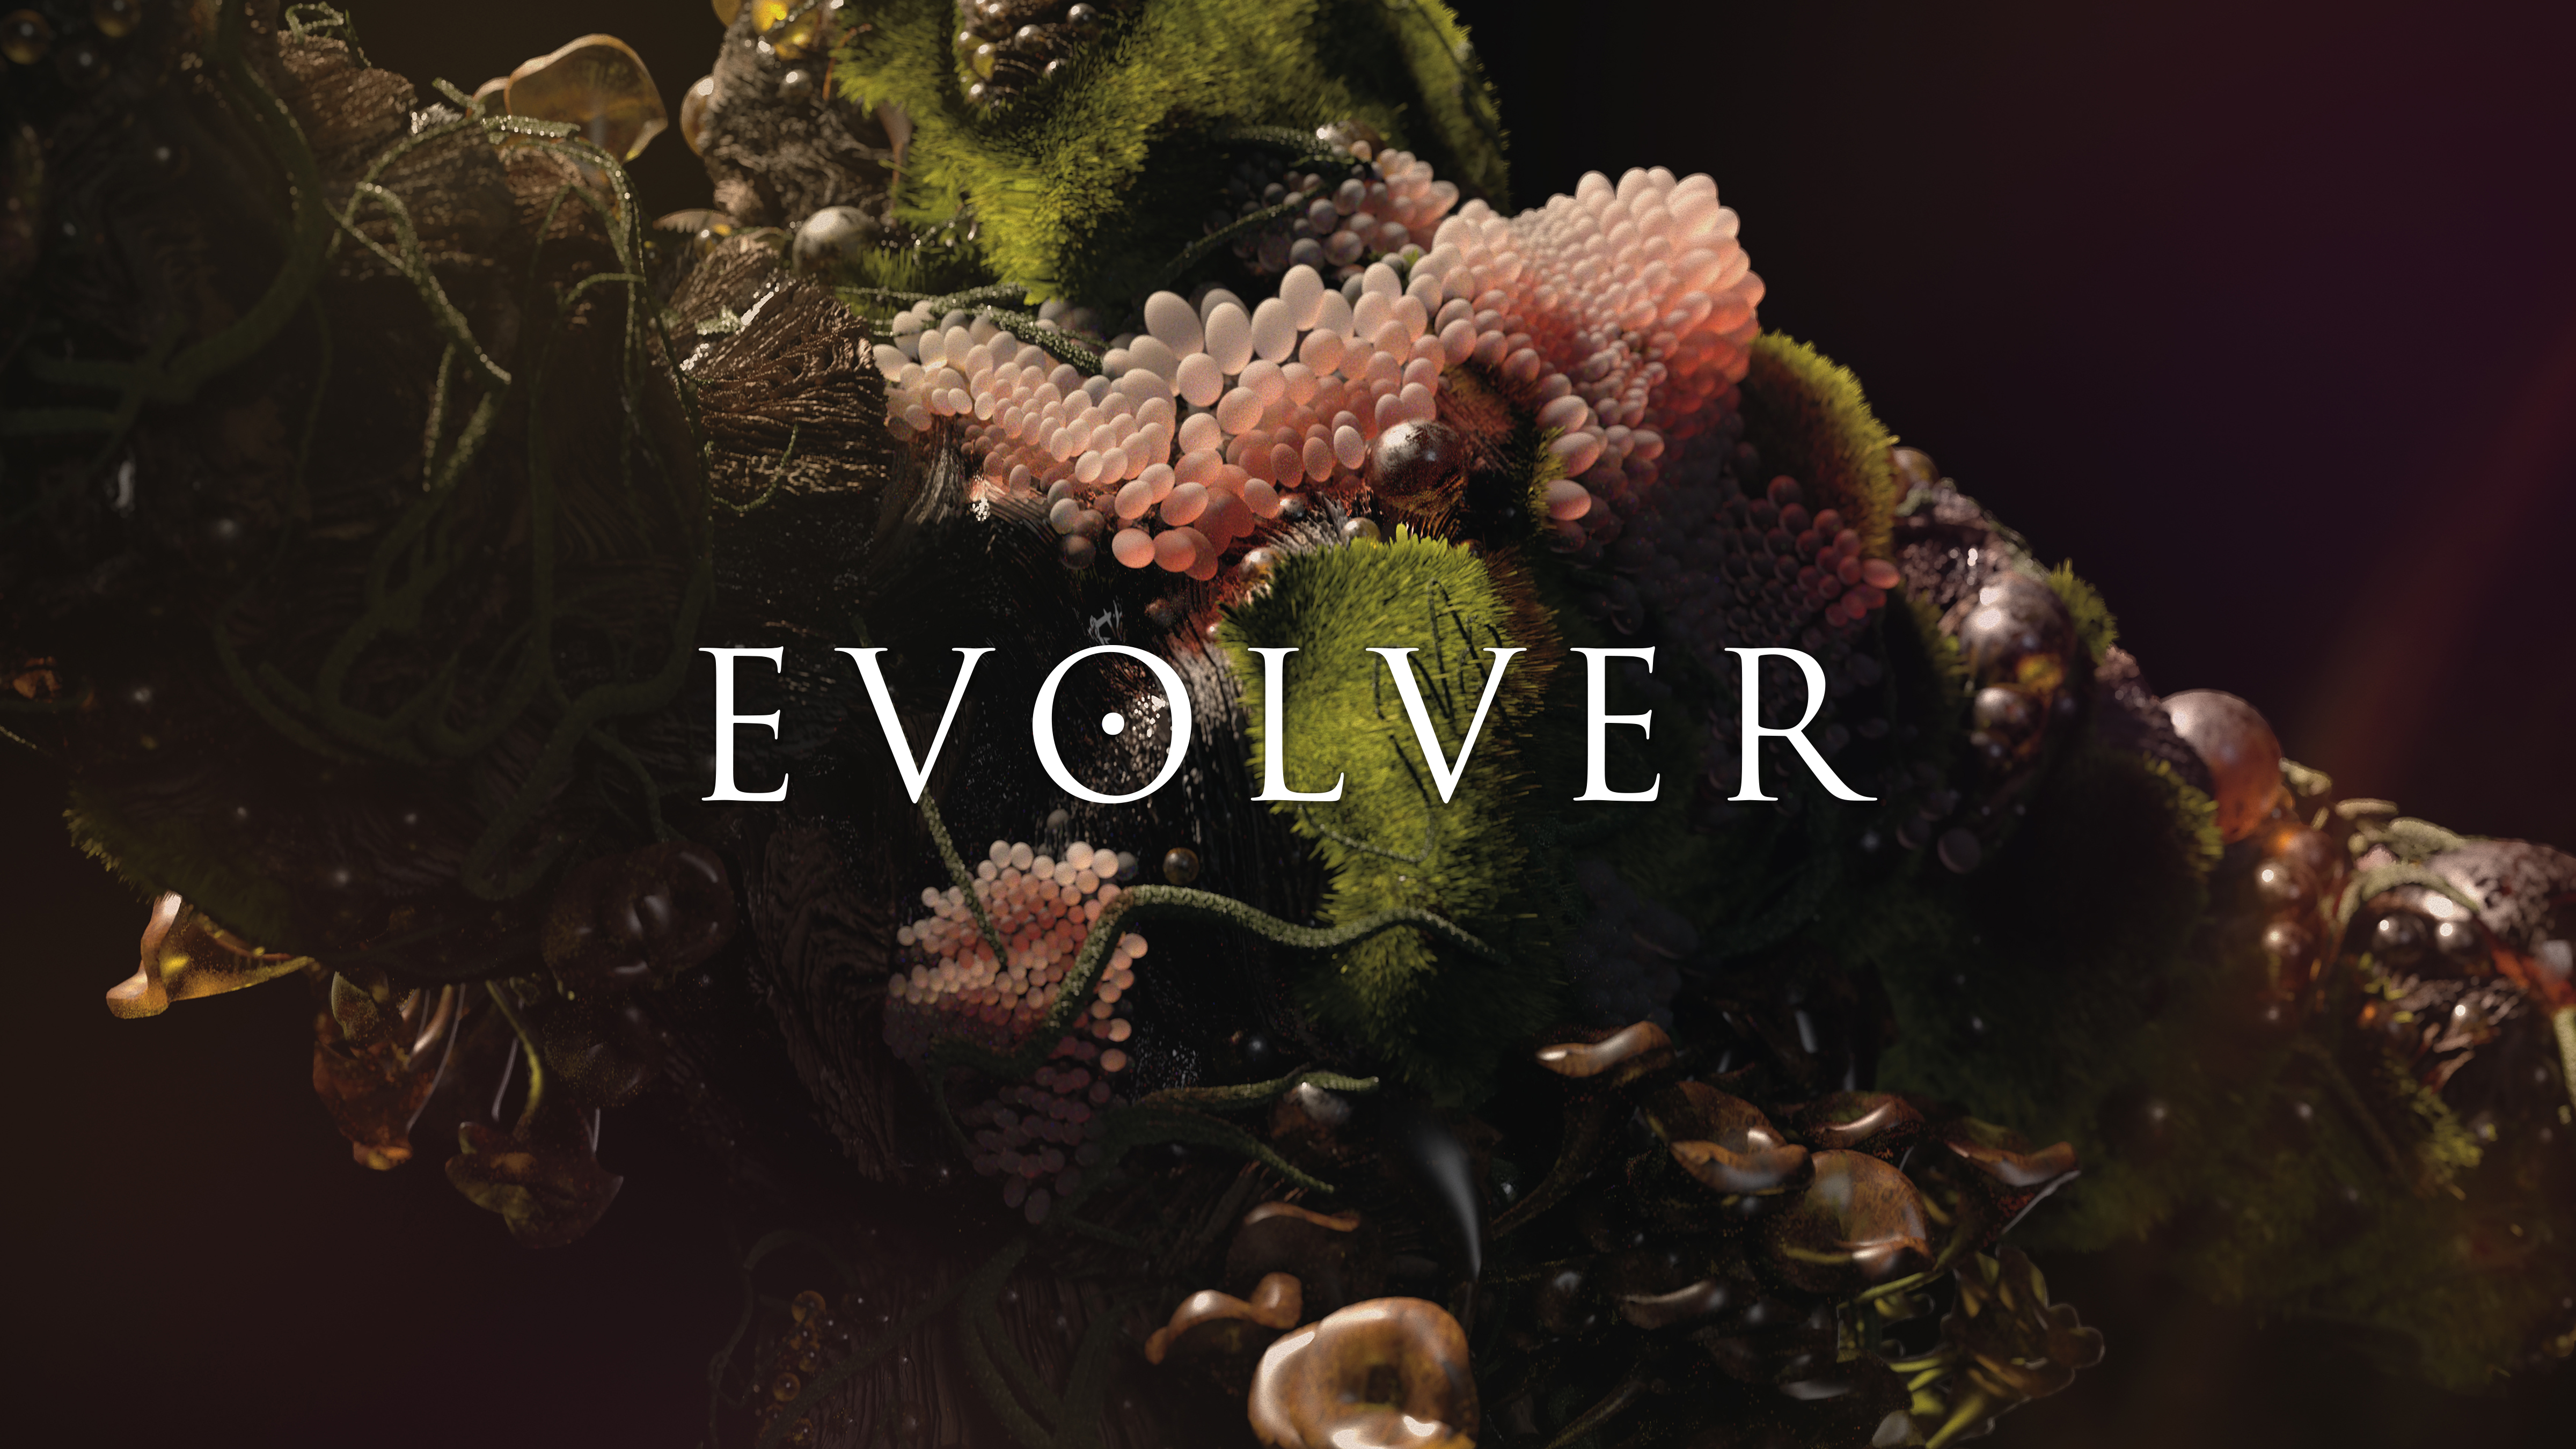 EVOLVER Preview Image